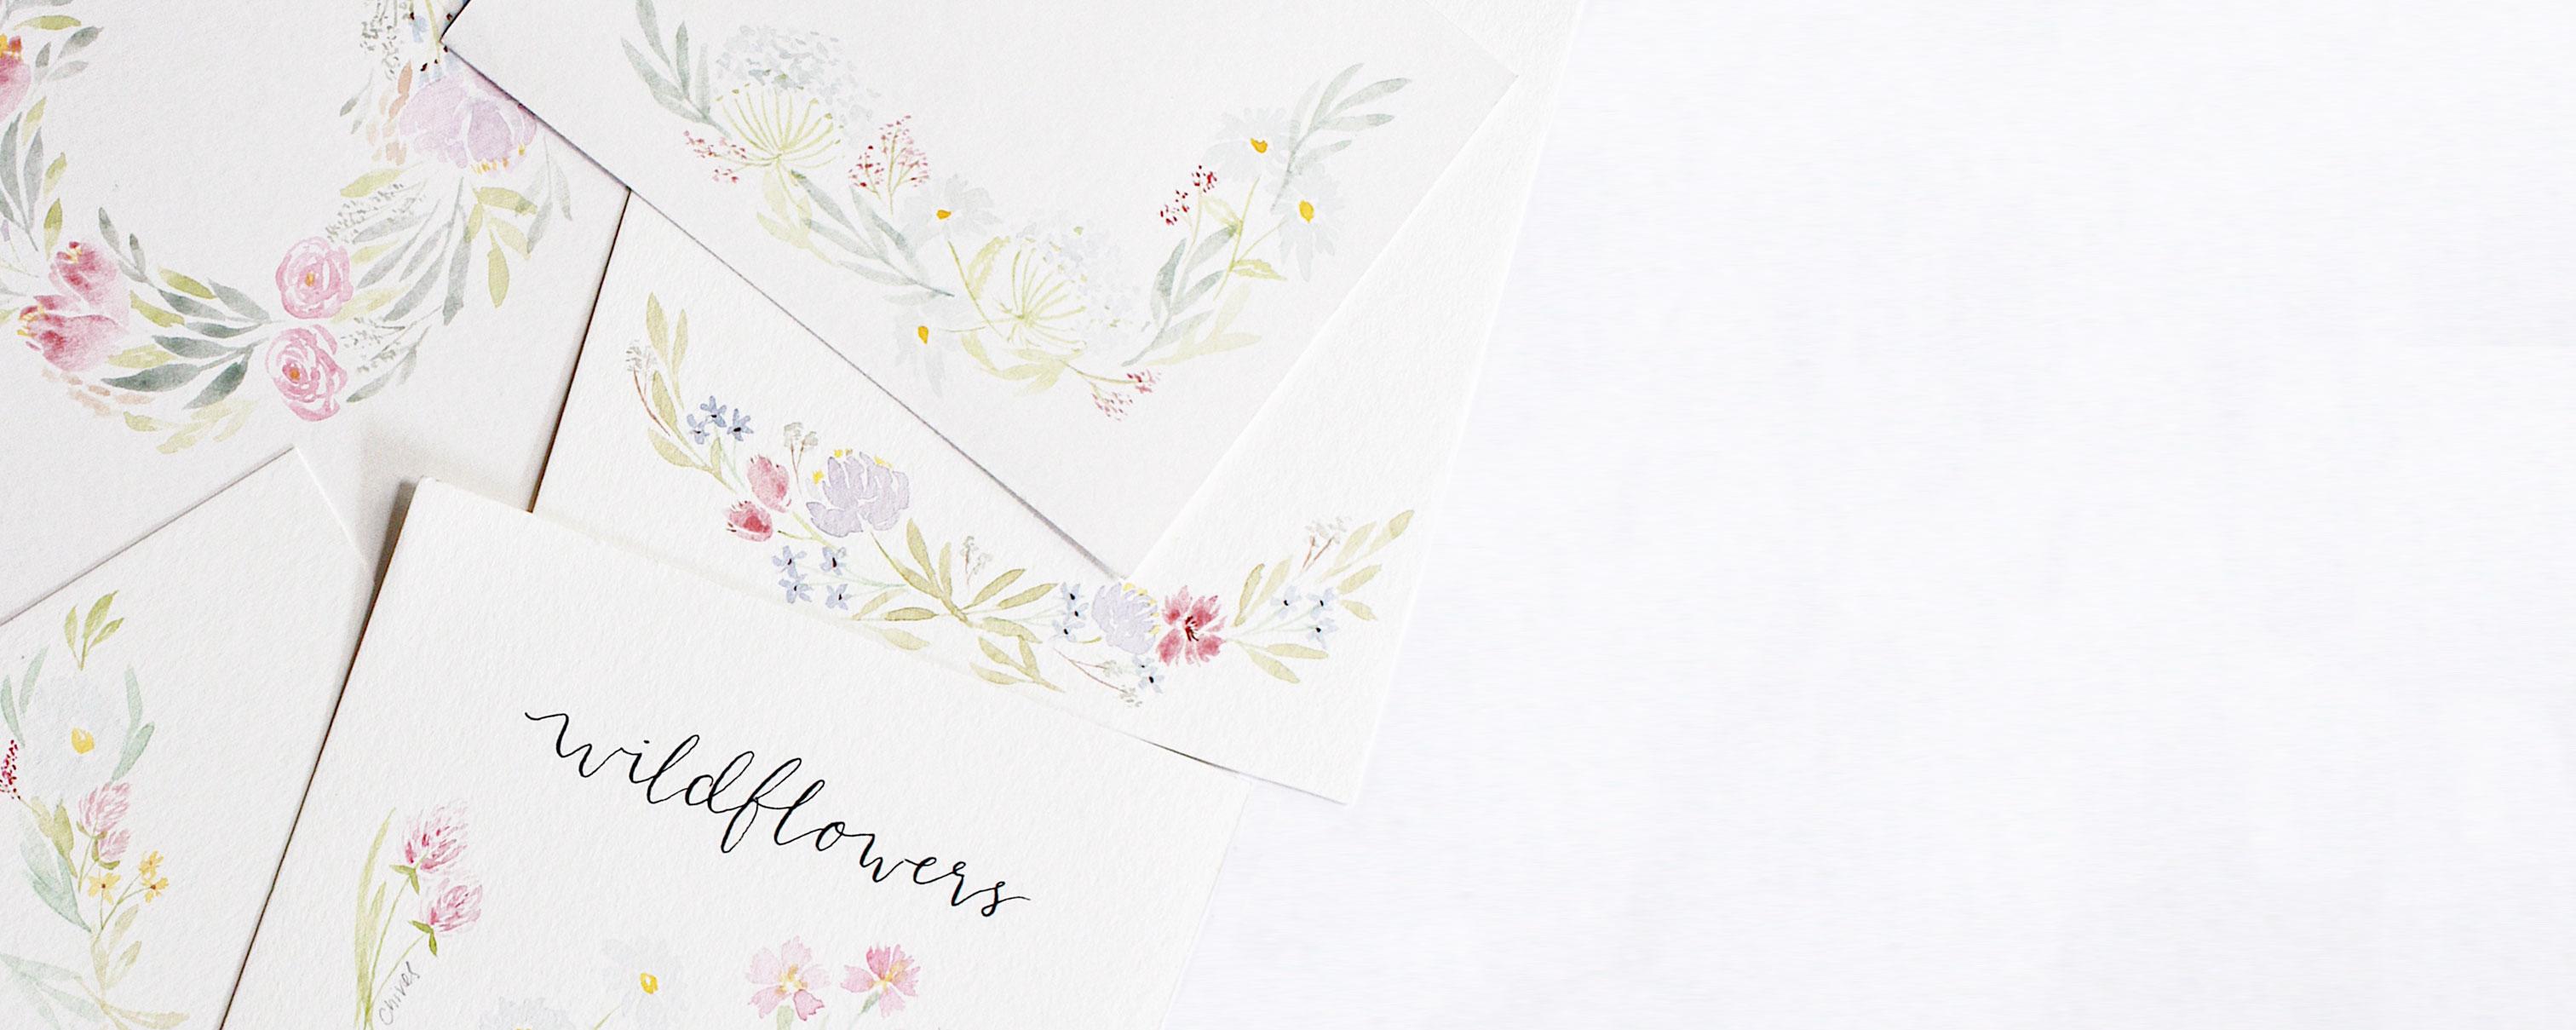 Watercolour Wildflowers